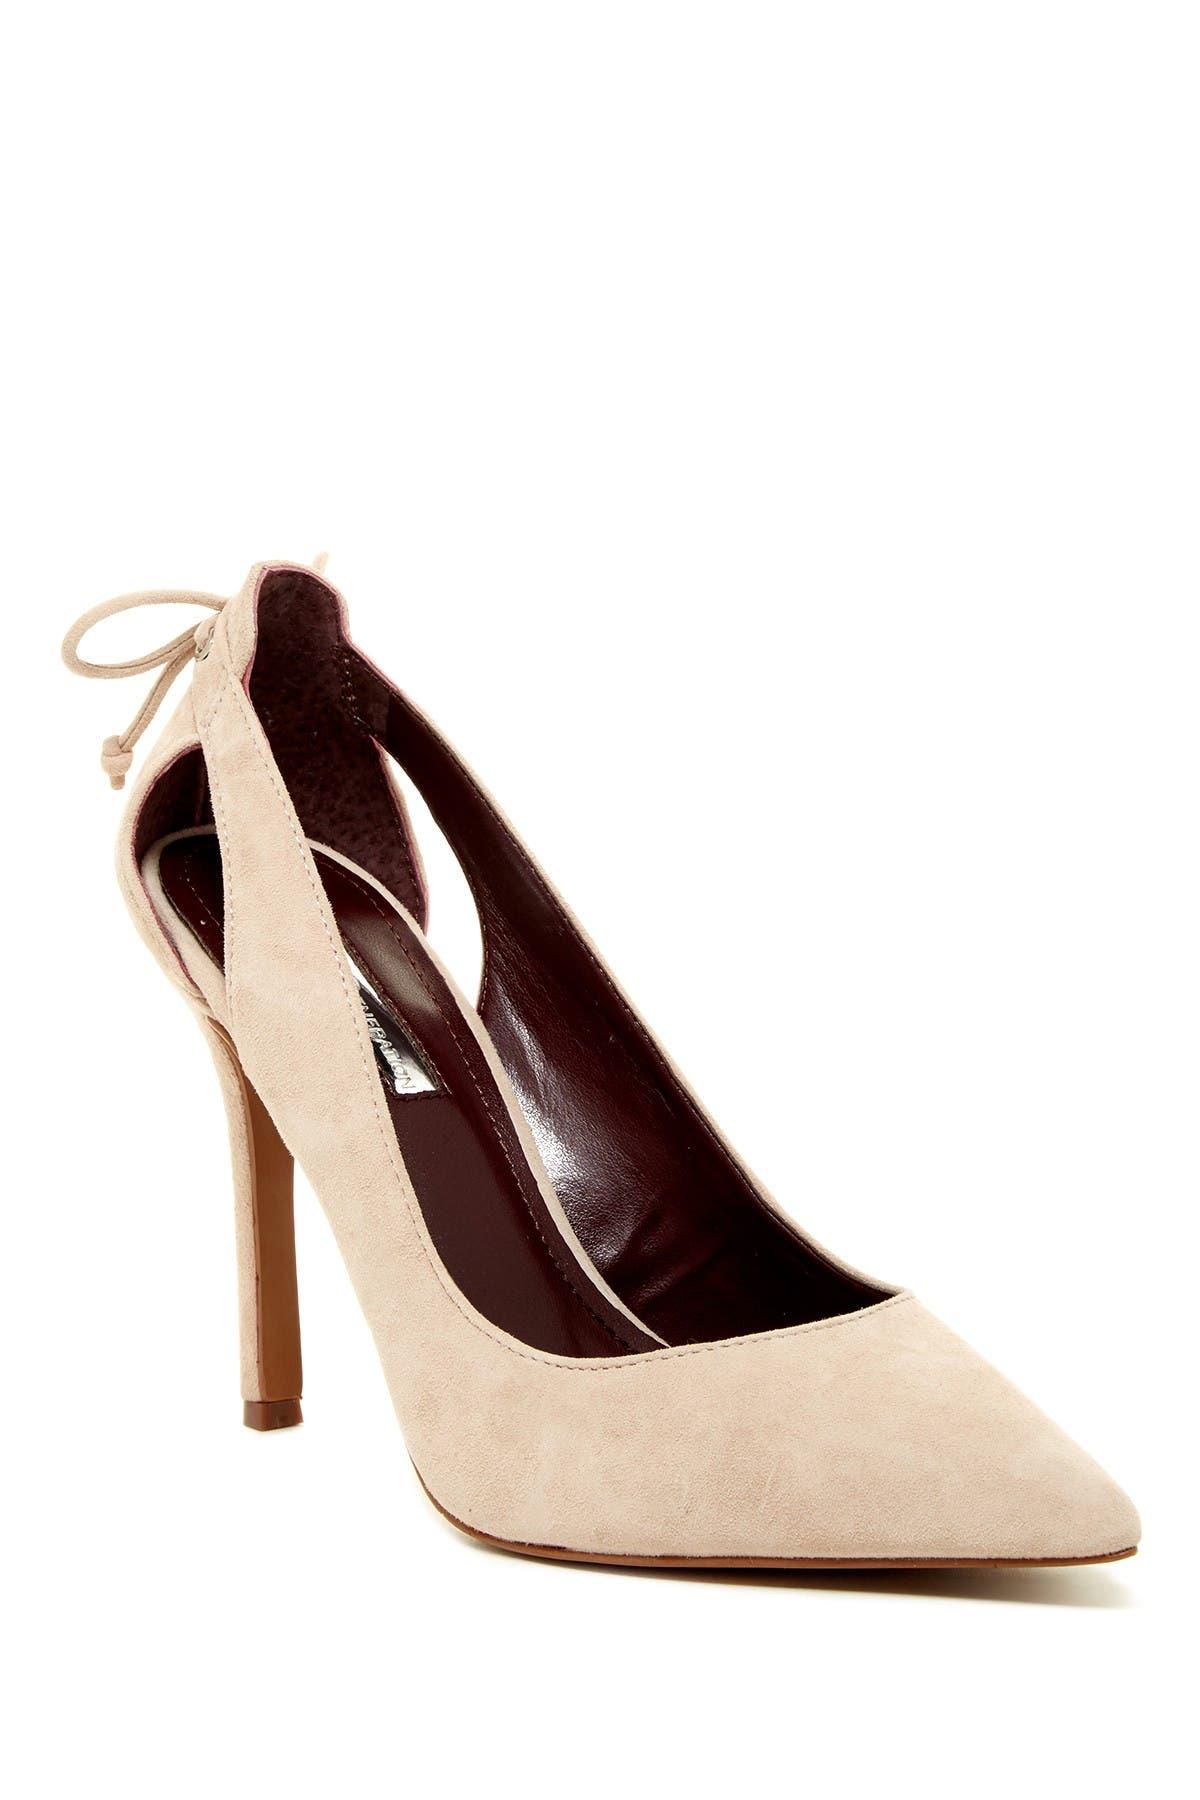 Image of BCBGeneration Tiarra Dress High Heel